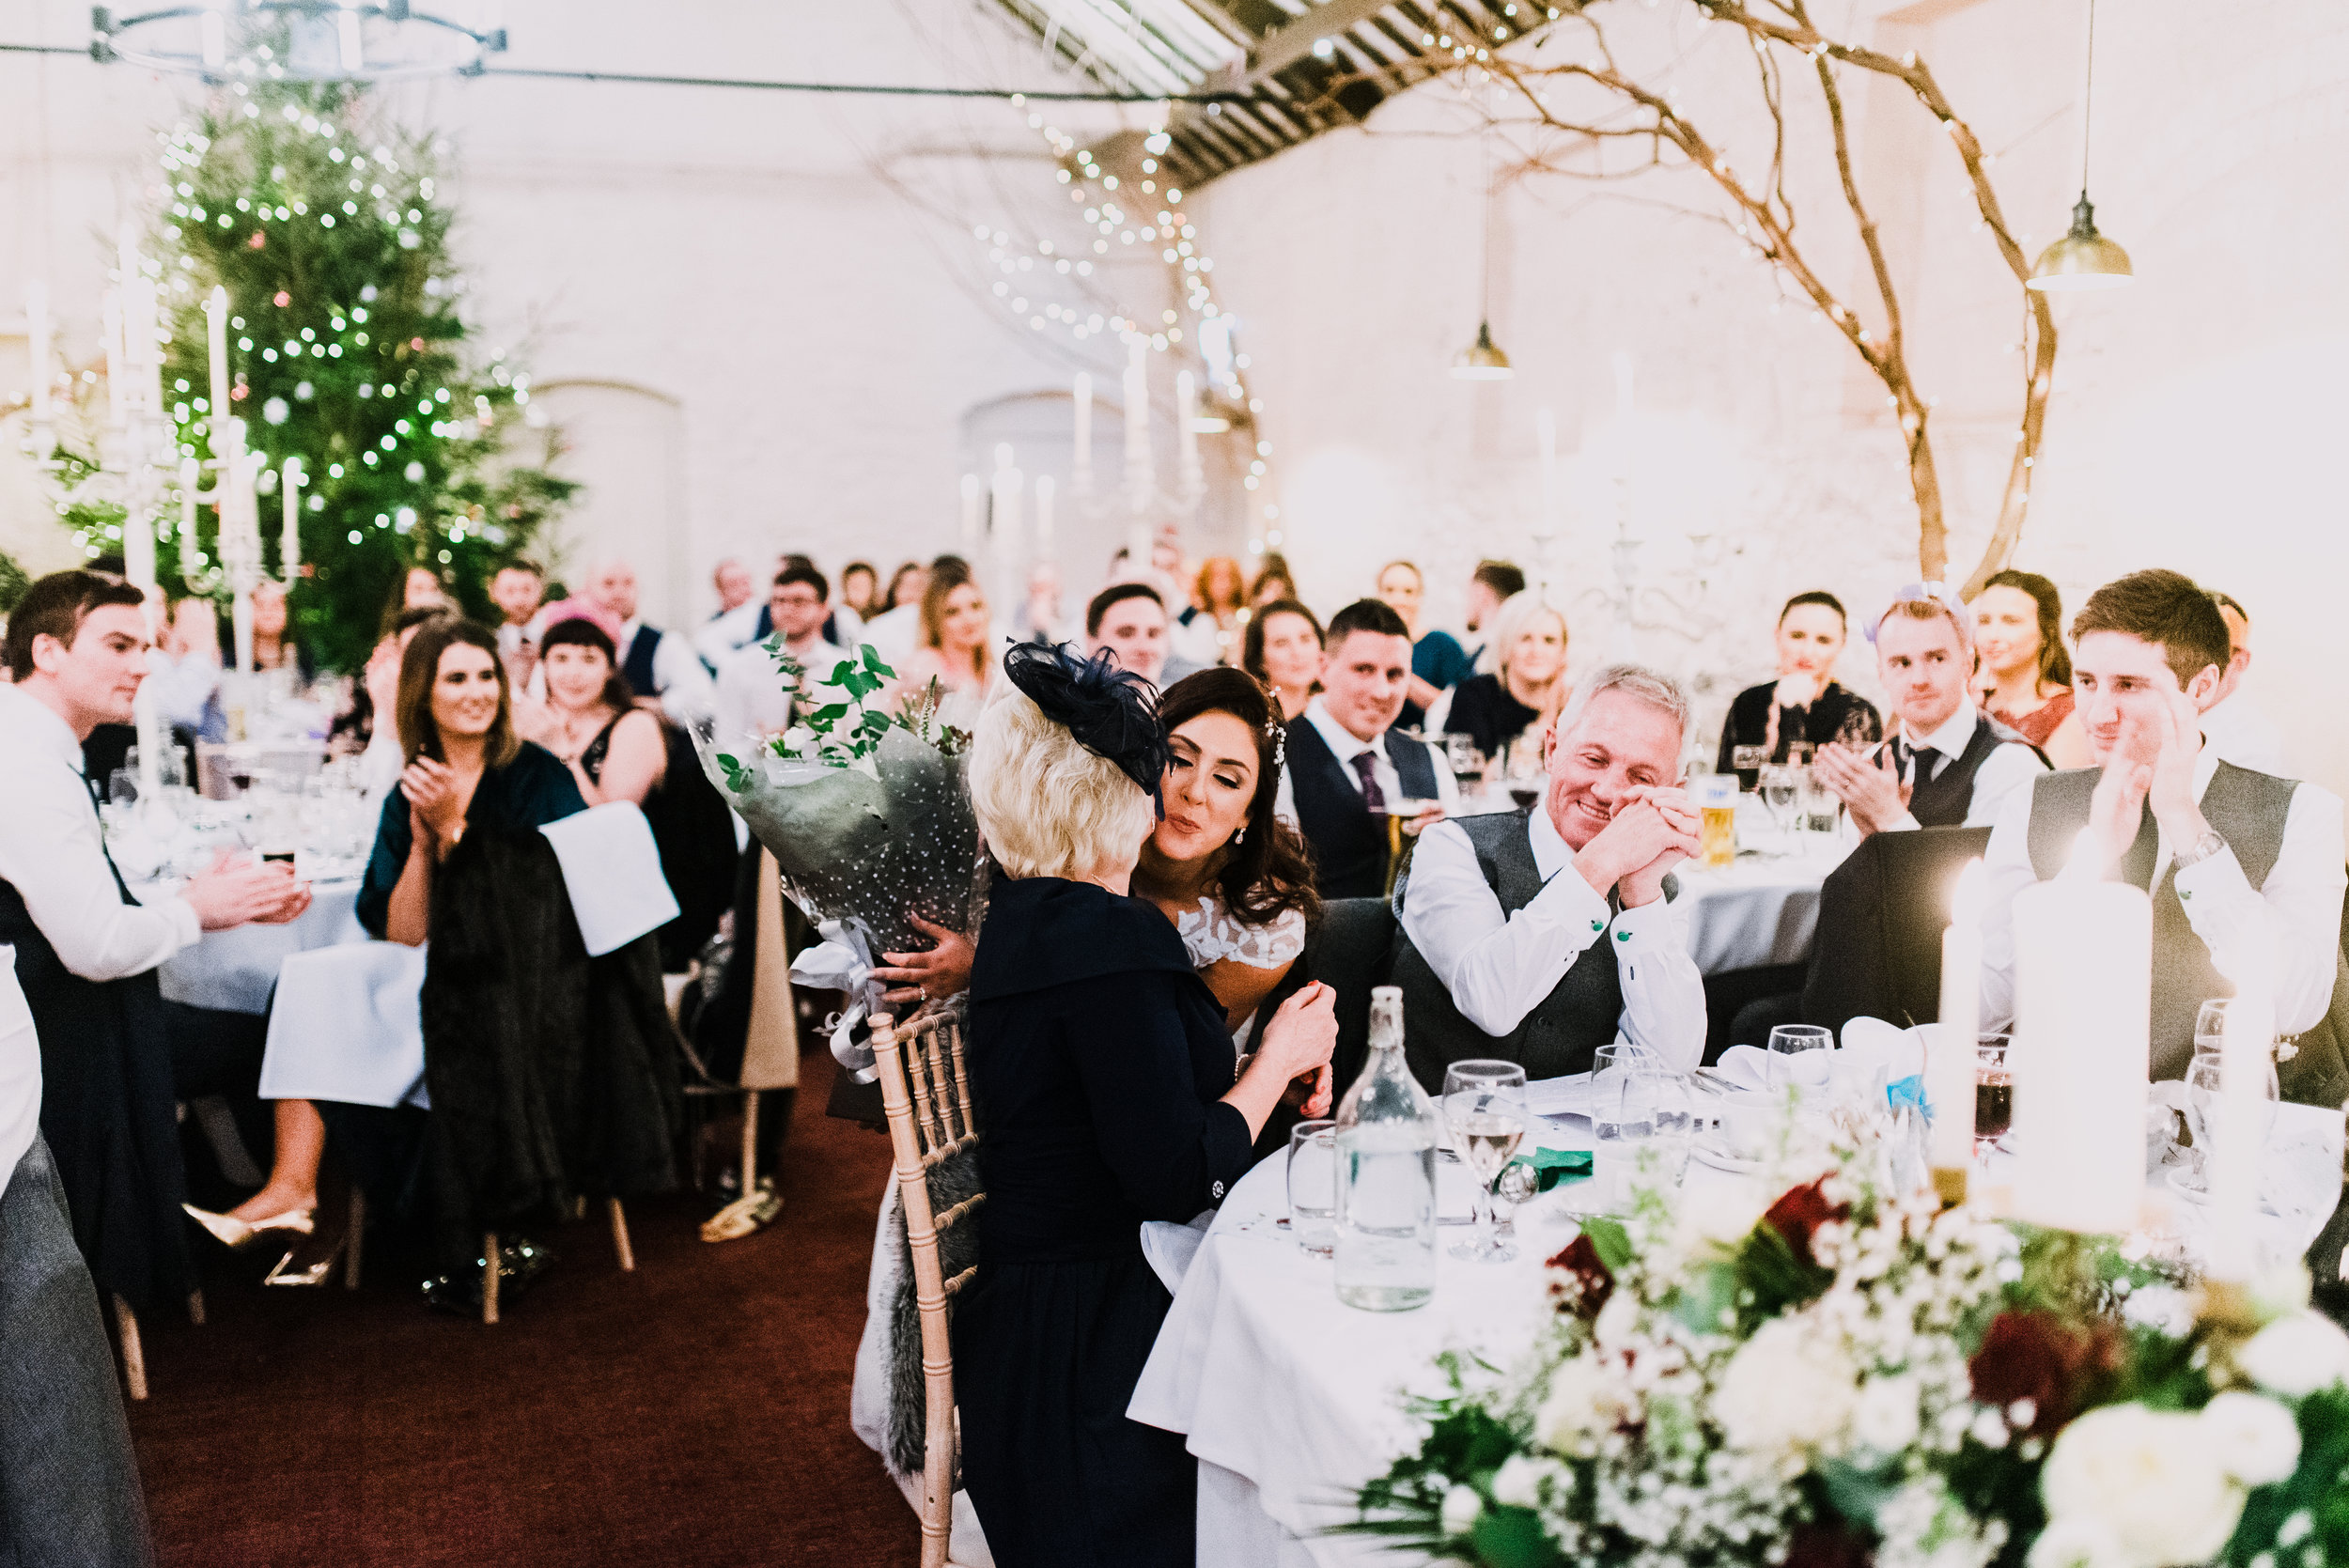 larchfield estate wedding, wedding venues northern ireland, barn wedding venues northern ireland, wedding photos larchfield estate, shane todd wedding, larchfield wedding decor ideas (16).jpg